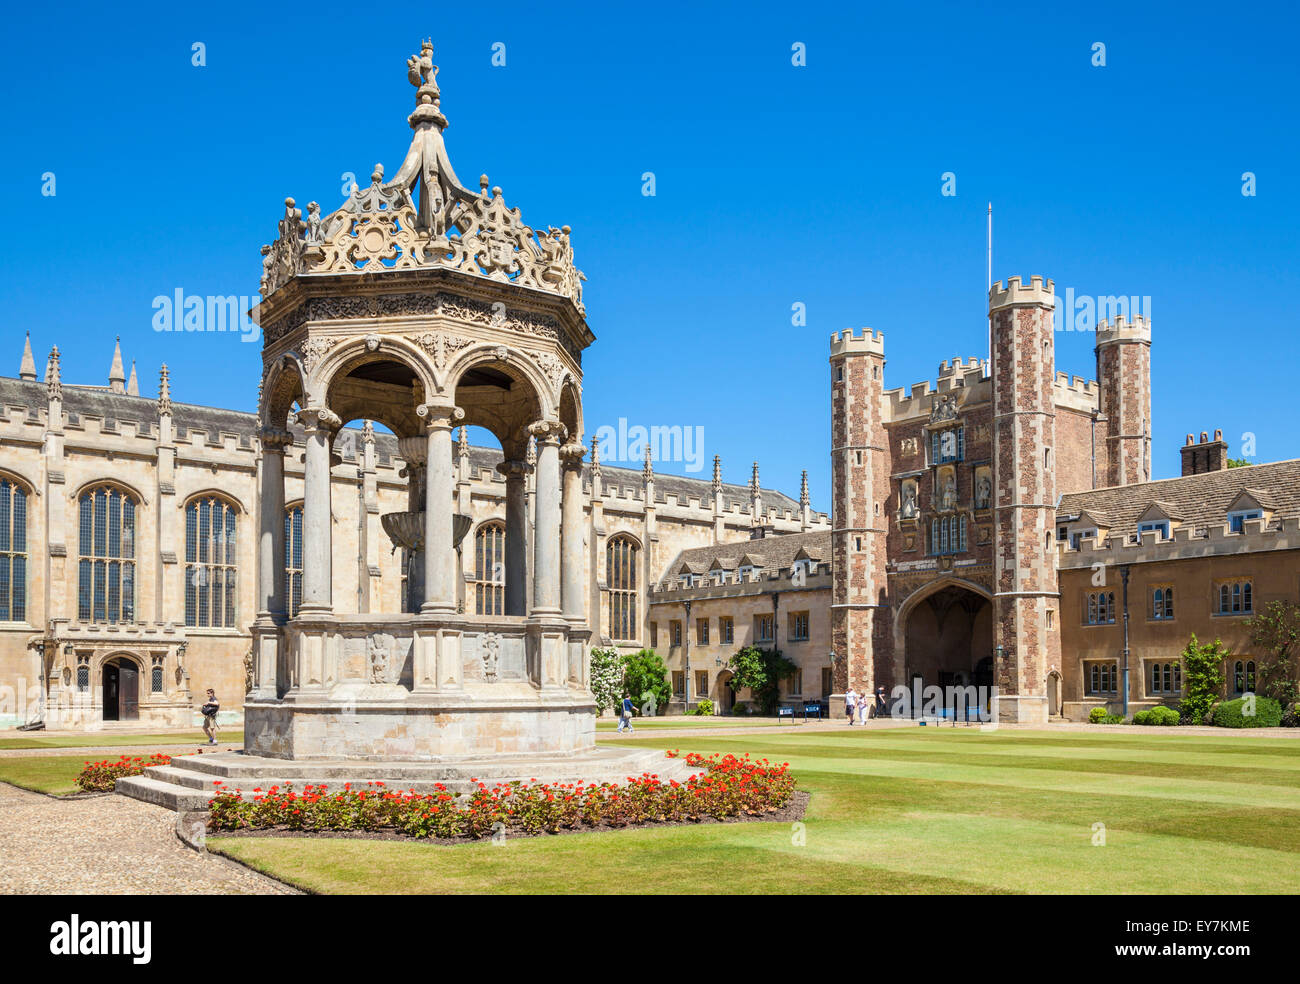 The Great Court Trinity College Cambridge University Cambridge Cambridgeshire England UK GB EU Europe - Stock Image